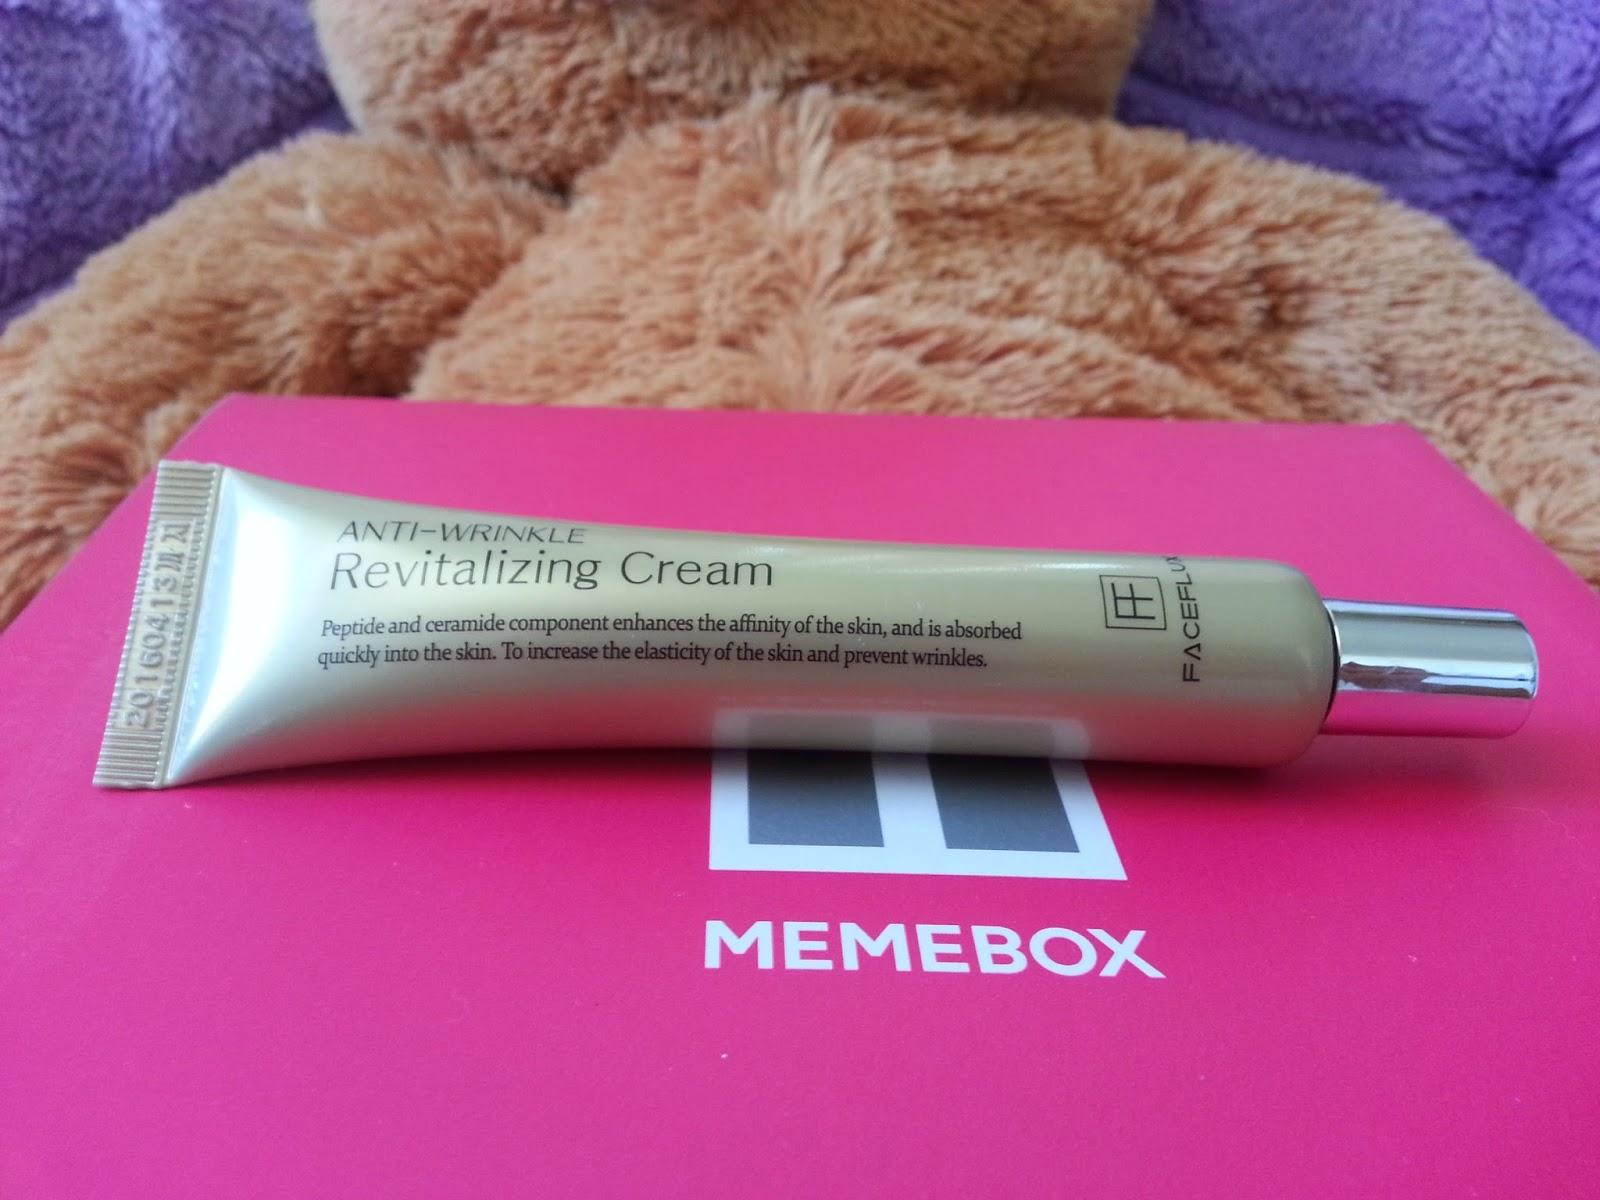 Faceflux Anti-Wrinkle Revitalizing Cream